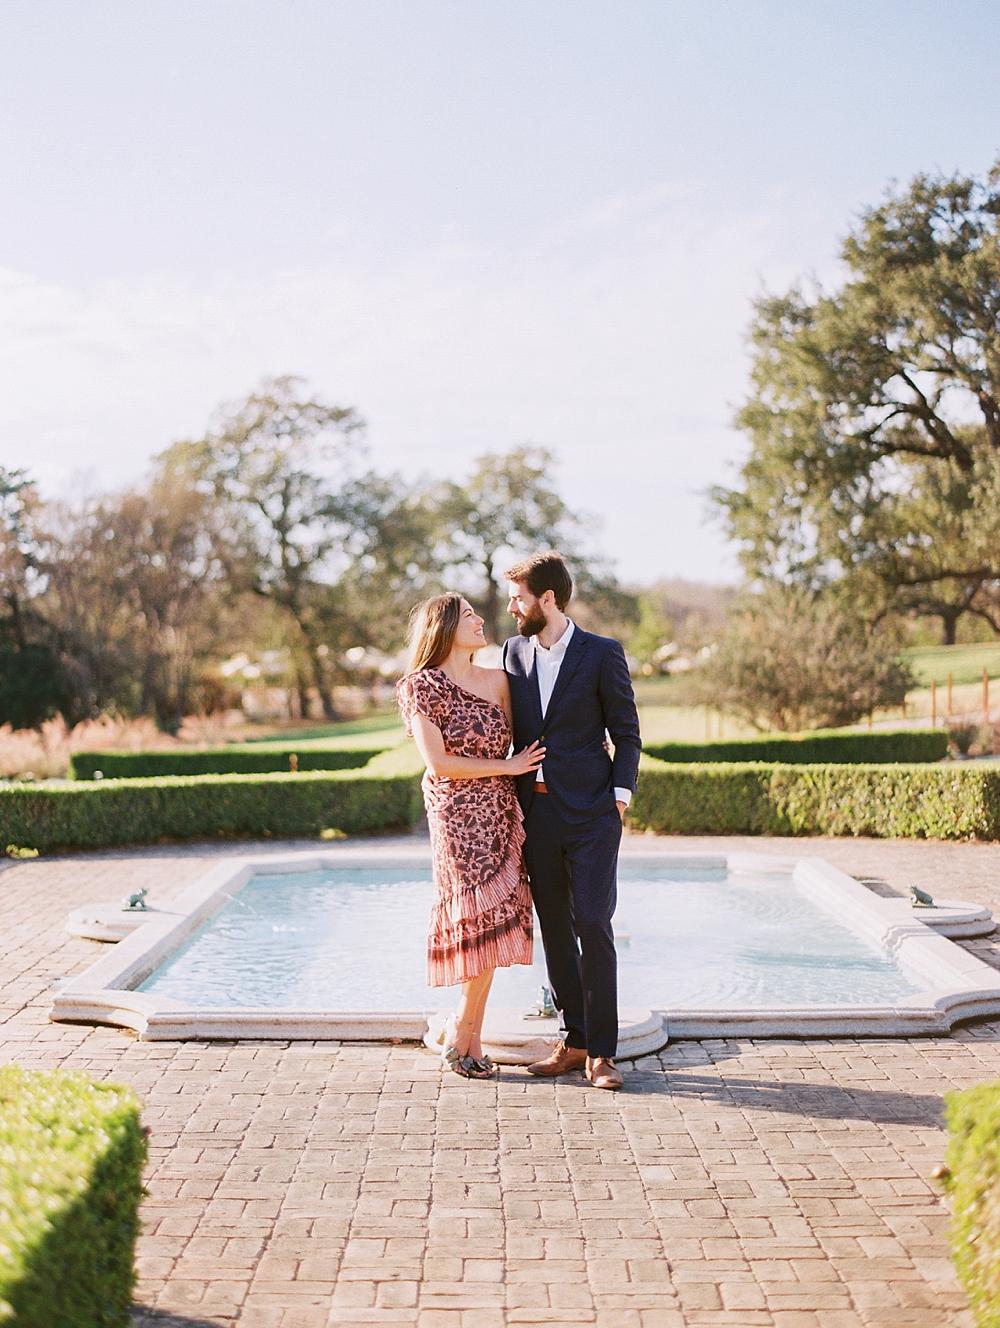 kristin-la-voie-photography-Austin-Wedding-Photographer-laguna-gloria-commodore-perry-estate-engagement-111